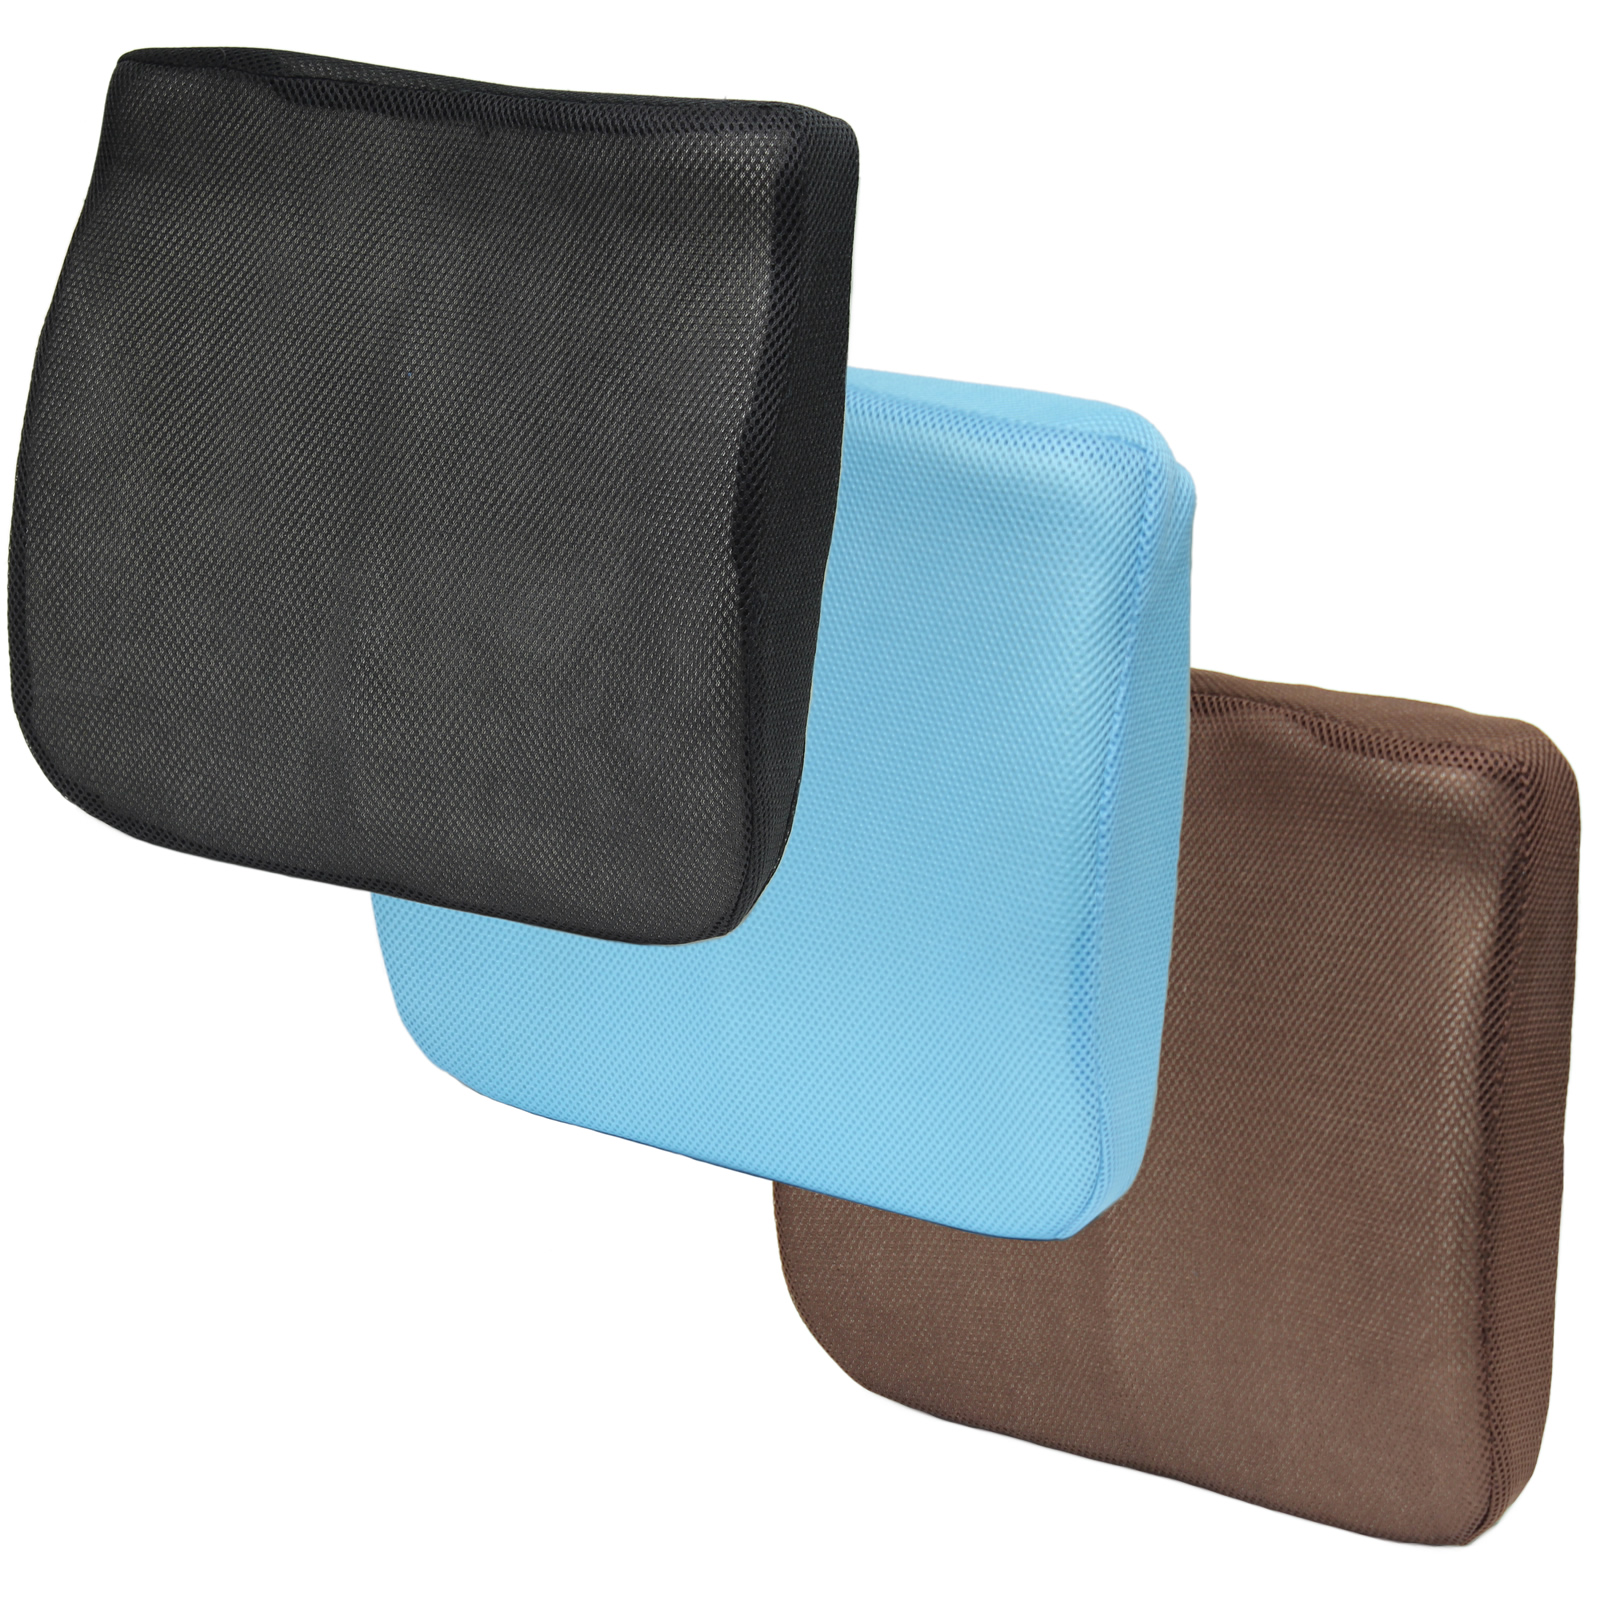 3D MESH MEMORY FOAM SEAT CUSHIONLOWER BACK LUMBAR SUPPORT